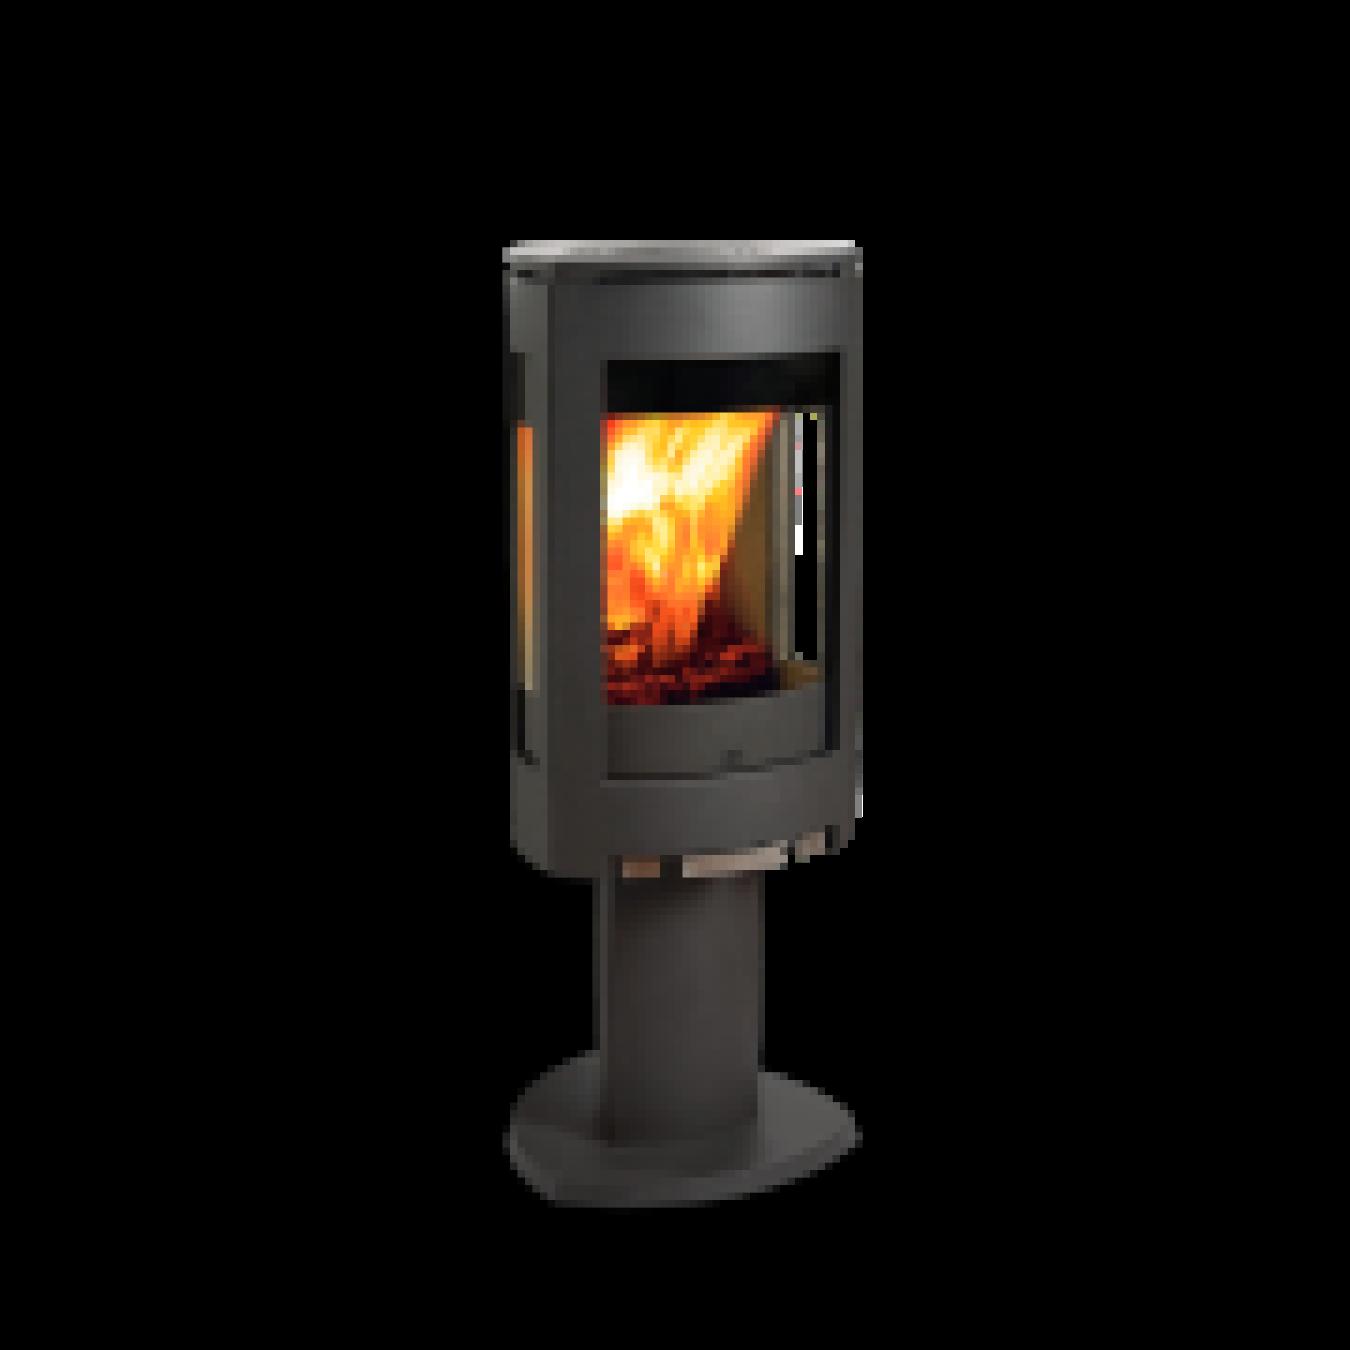 po les bois j tul cheminee fireplace pinterest poele a bois poele a bois jotul et. Black Bedroom Furniture Sets. Home Design Ideas